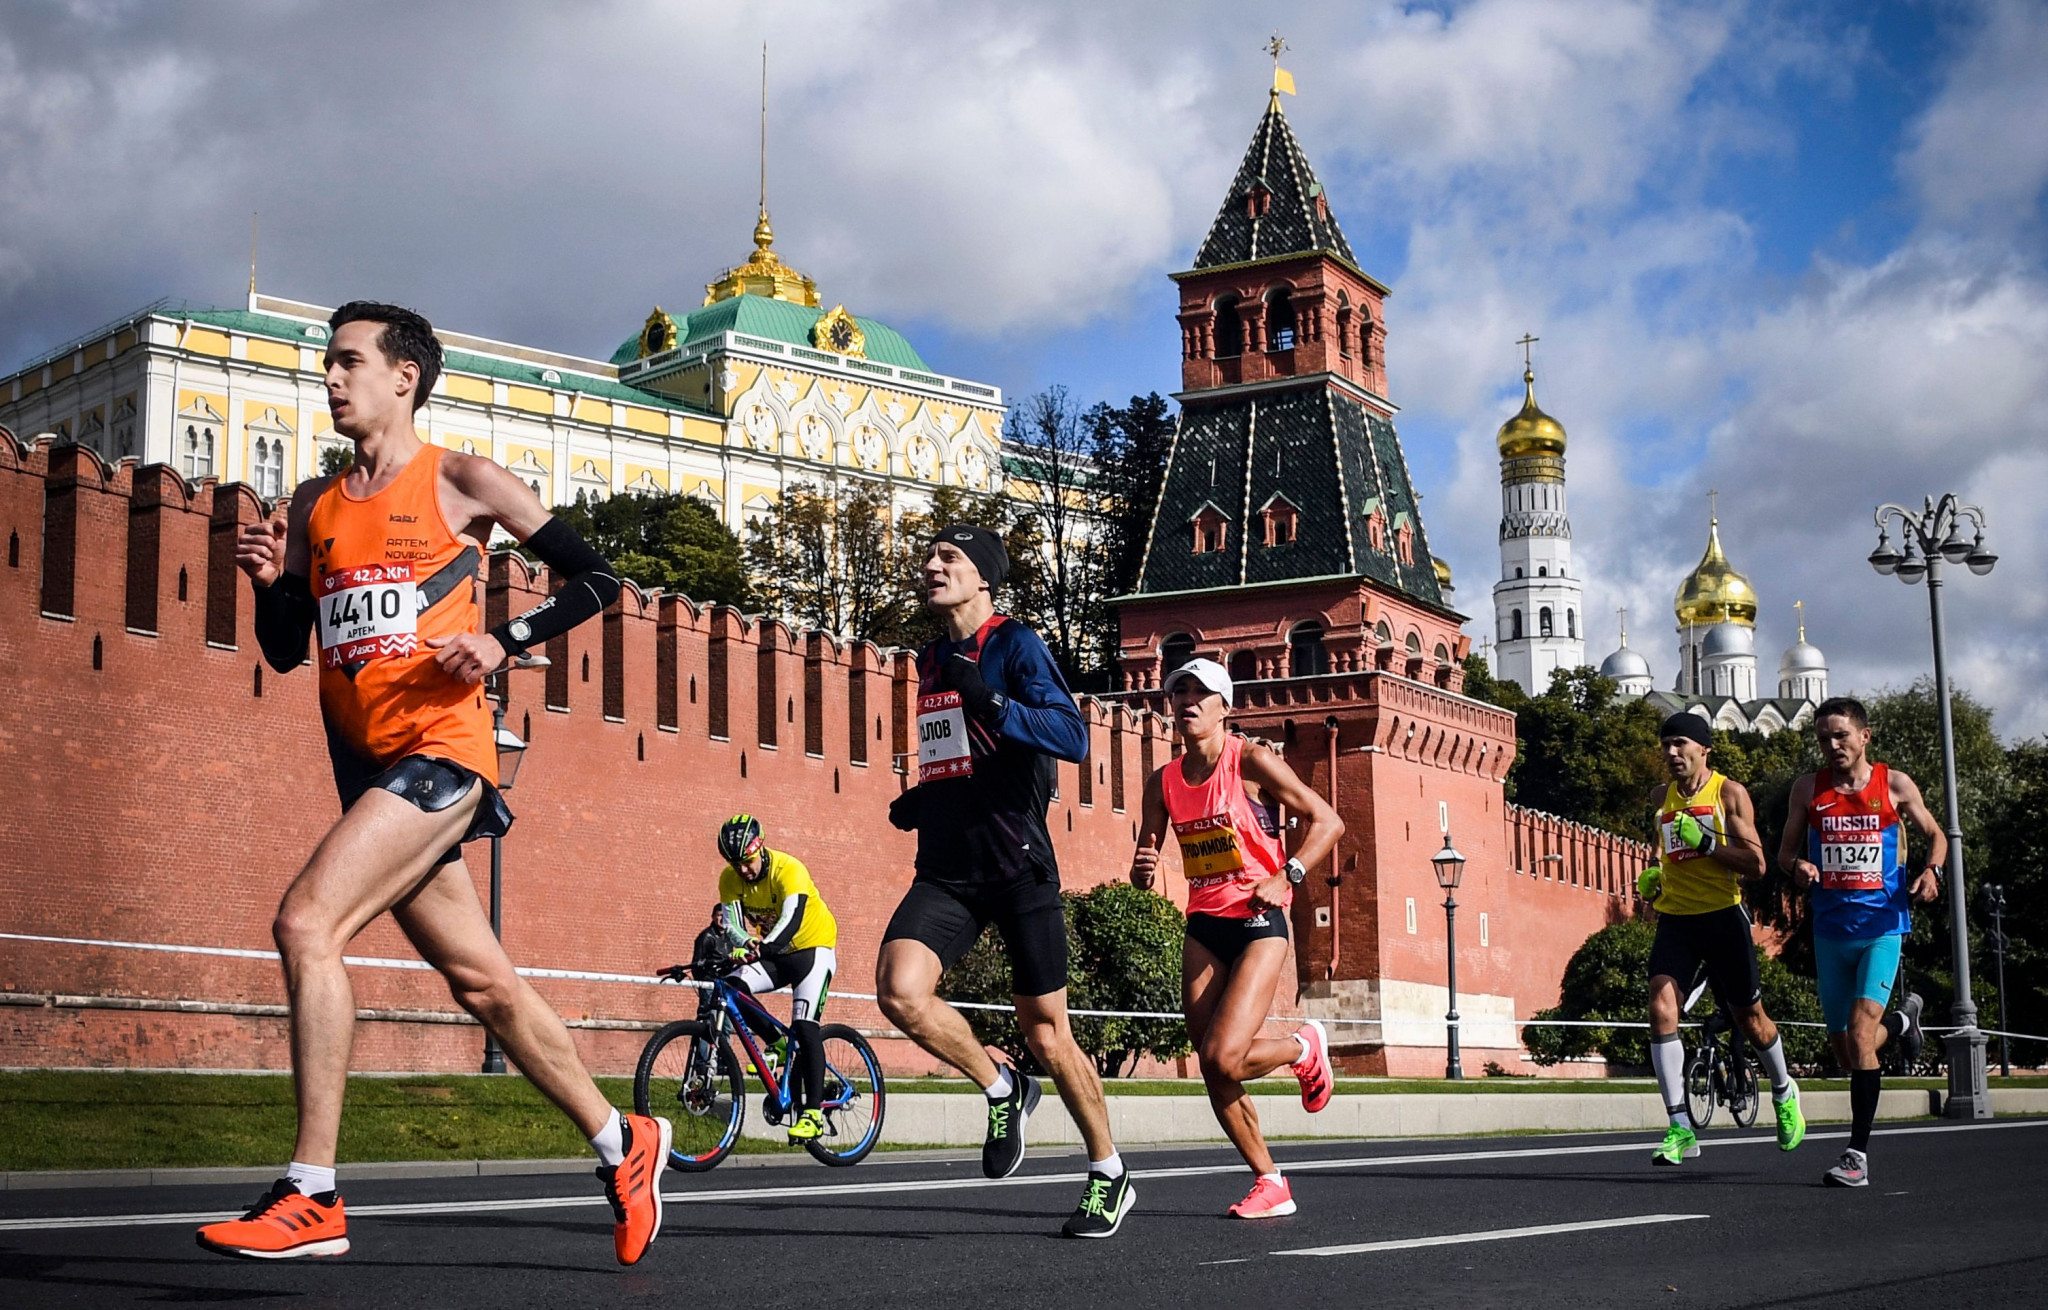 Moscow Marathon postponed until 2022 amid COVID-19 restrictions